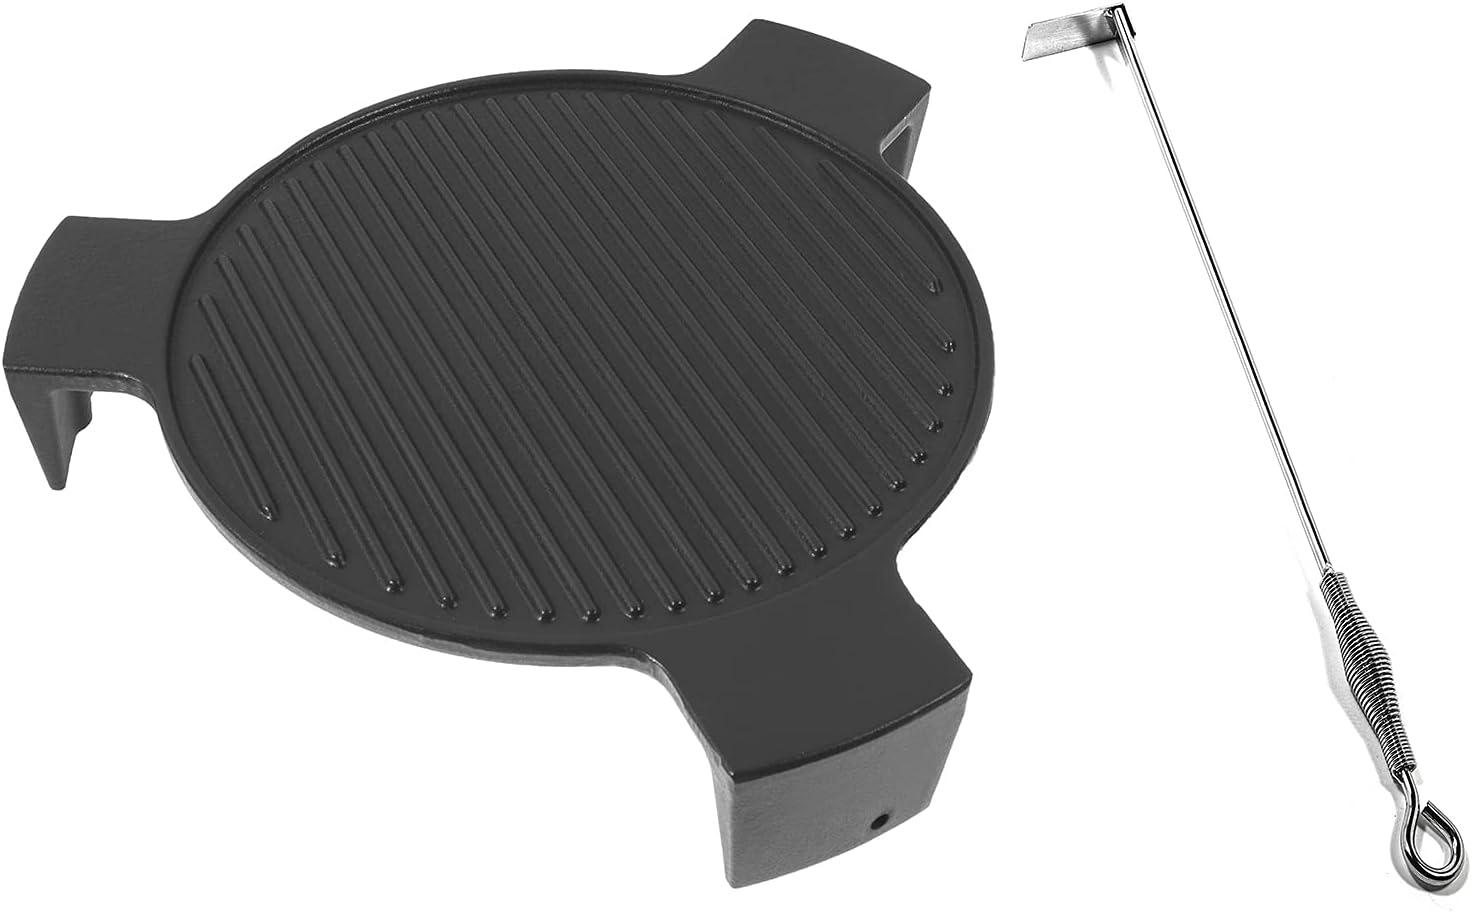 DELSbbq Cast Iron Plate Setter for Egg Big Kamad 日本メーカー新品 Green Large 開催中 18